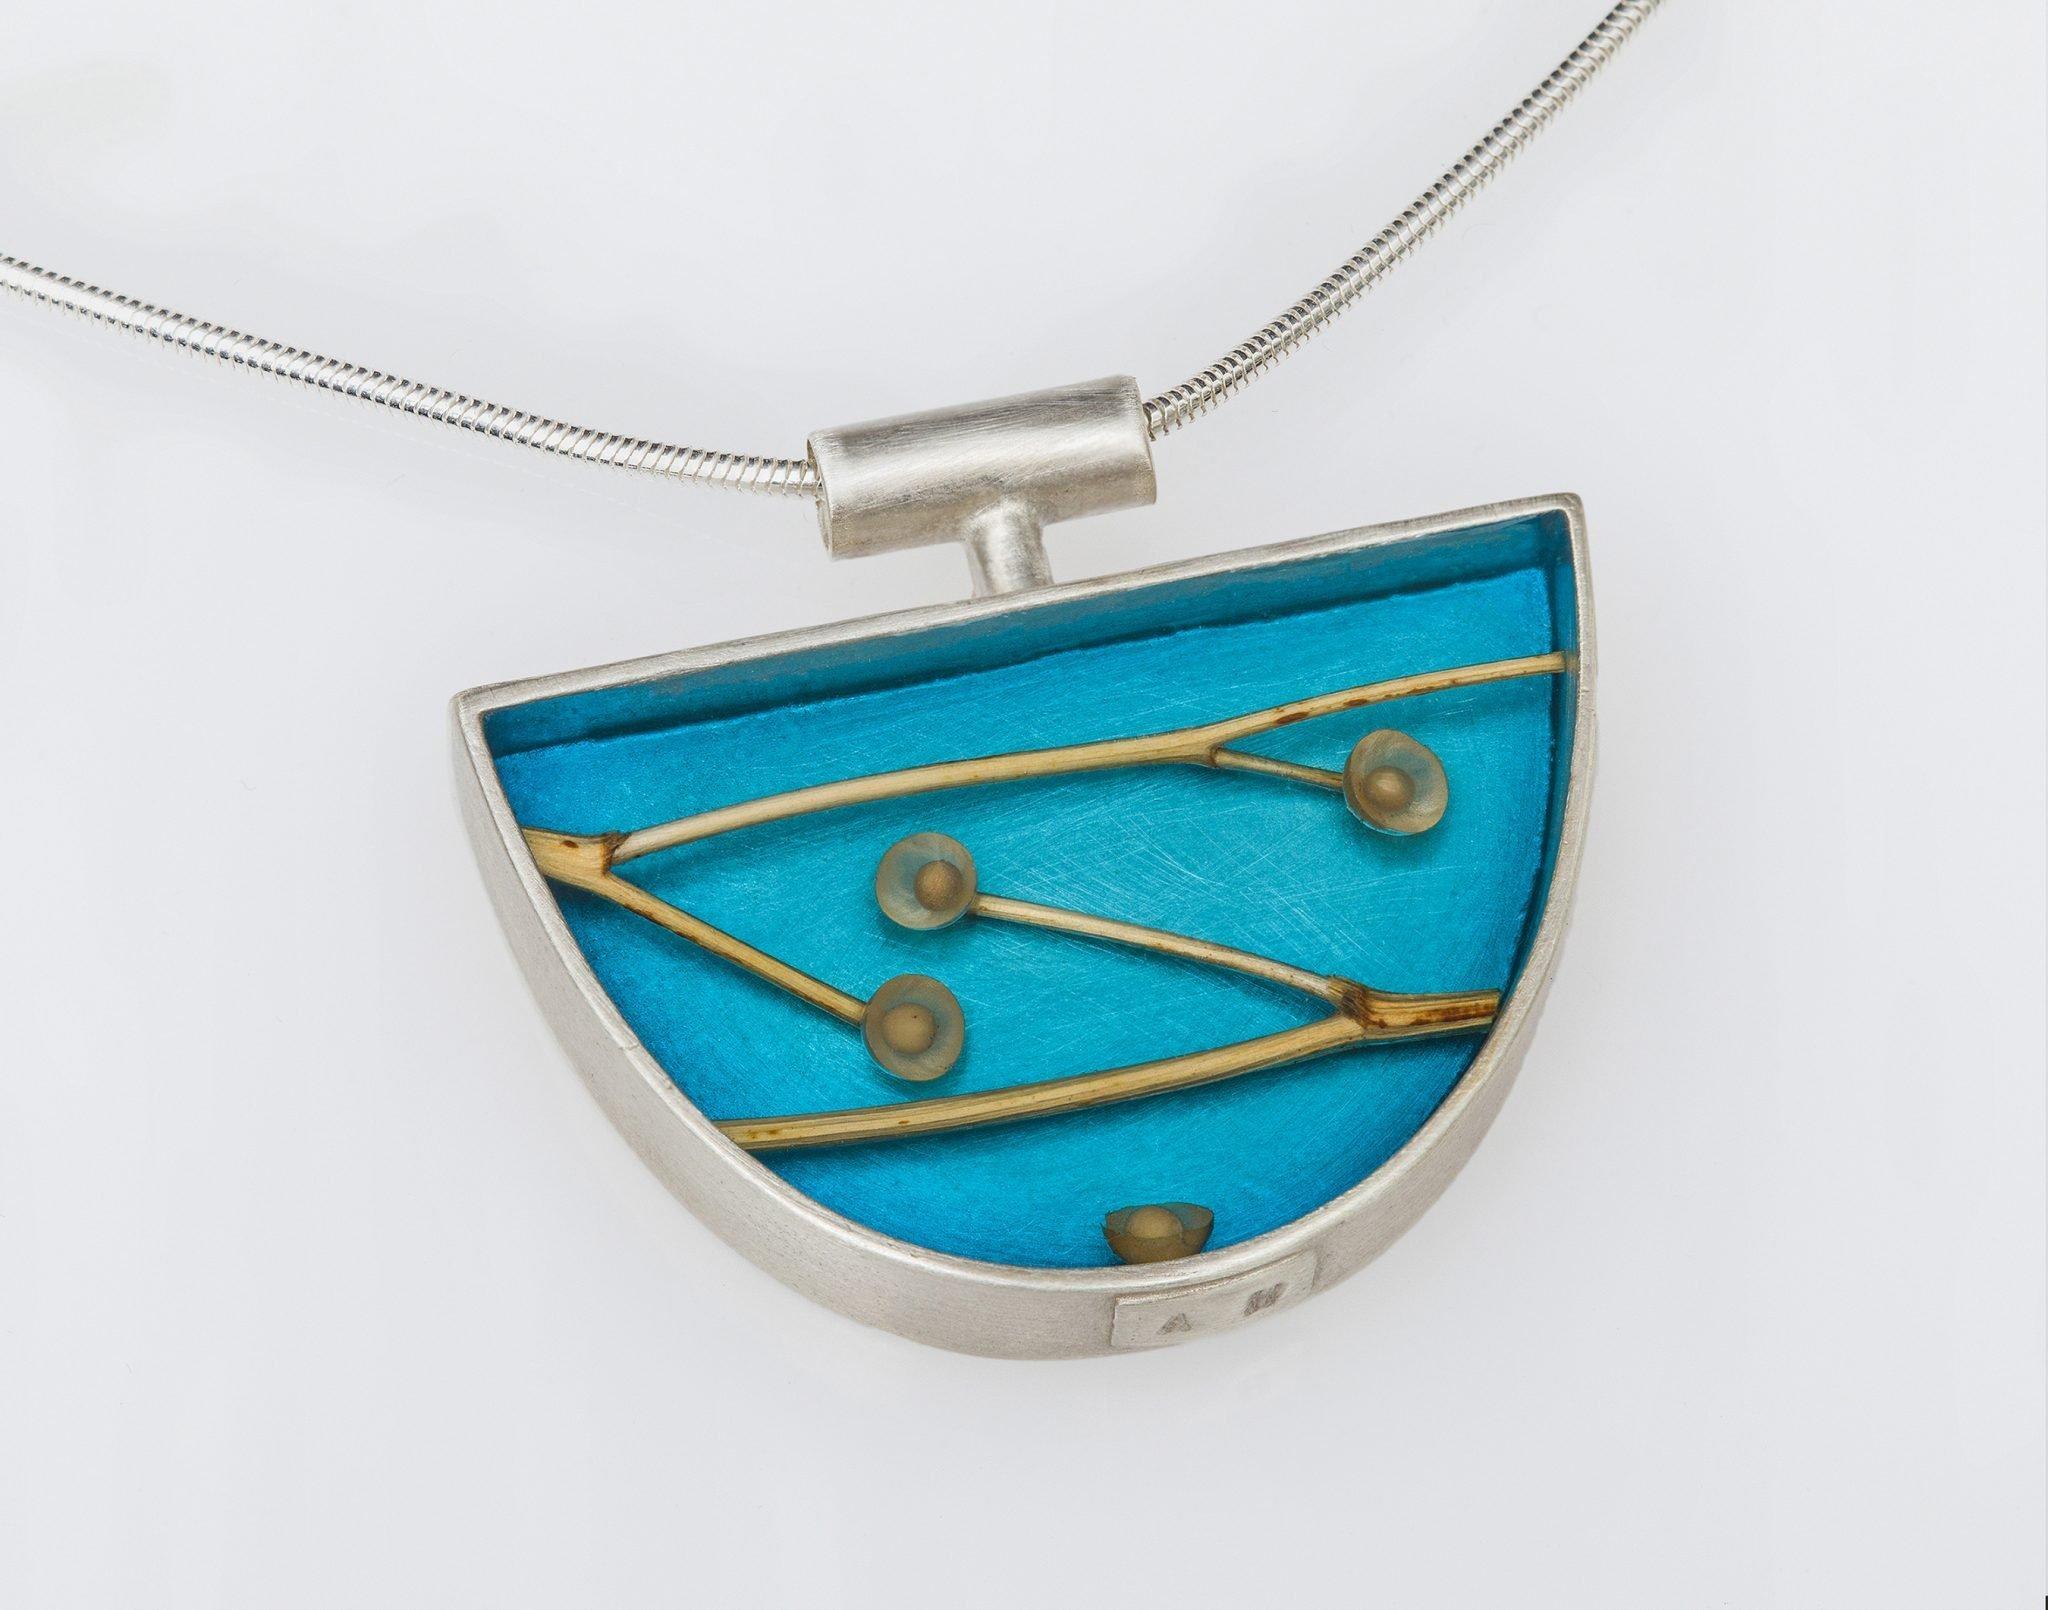 Haffner-Andrea_halfmoonpendant-jewelry-1.75x1.5x.25_